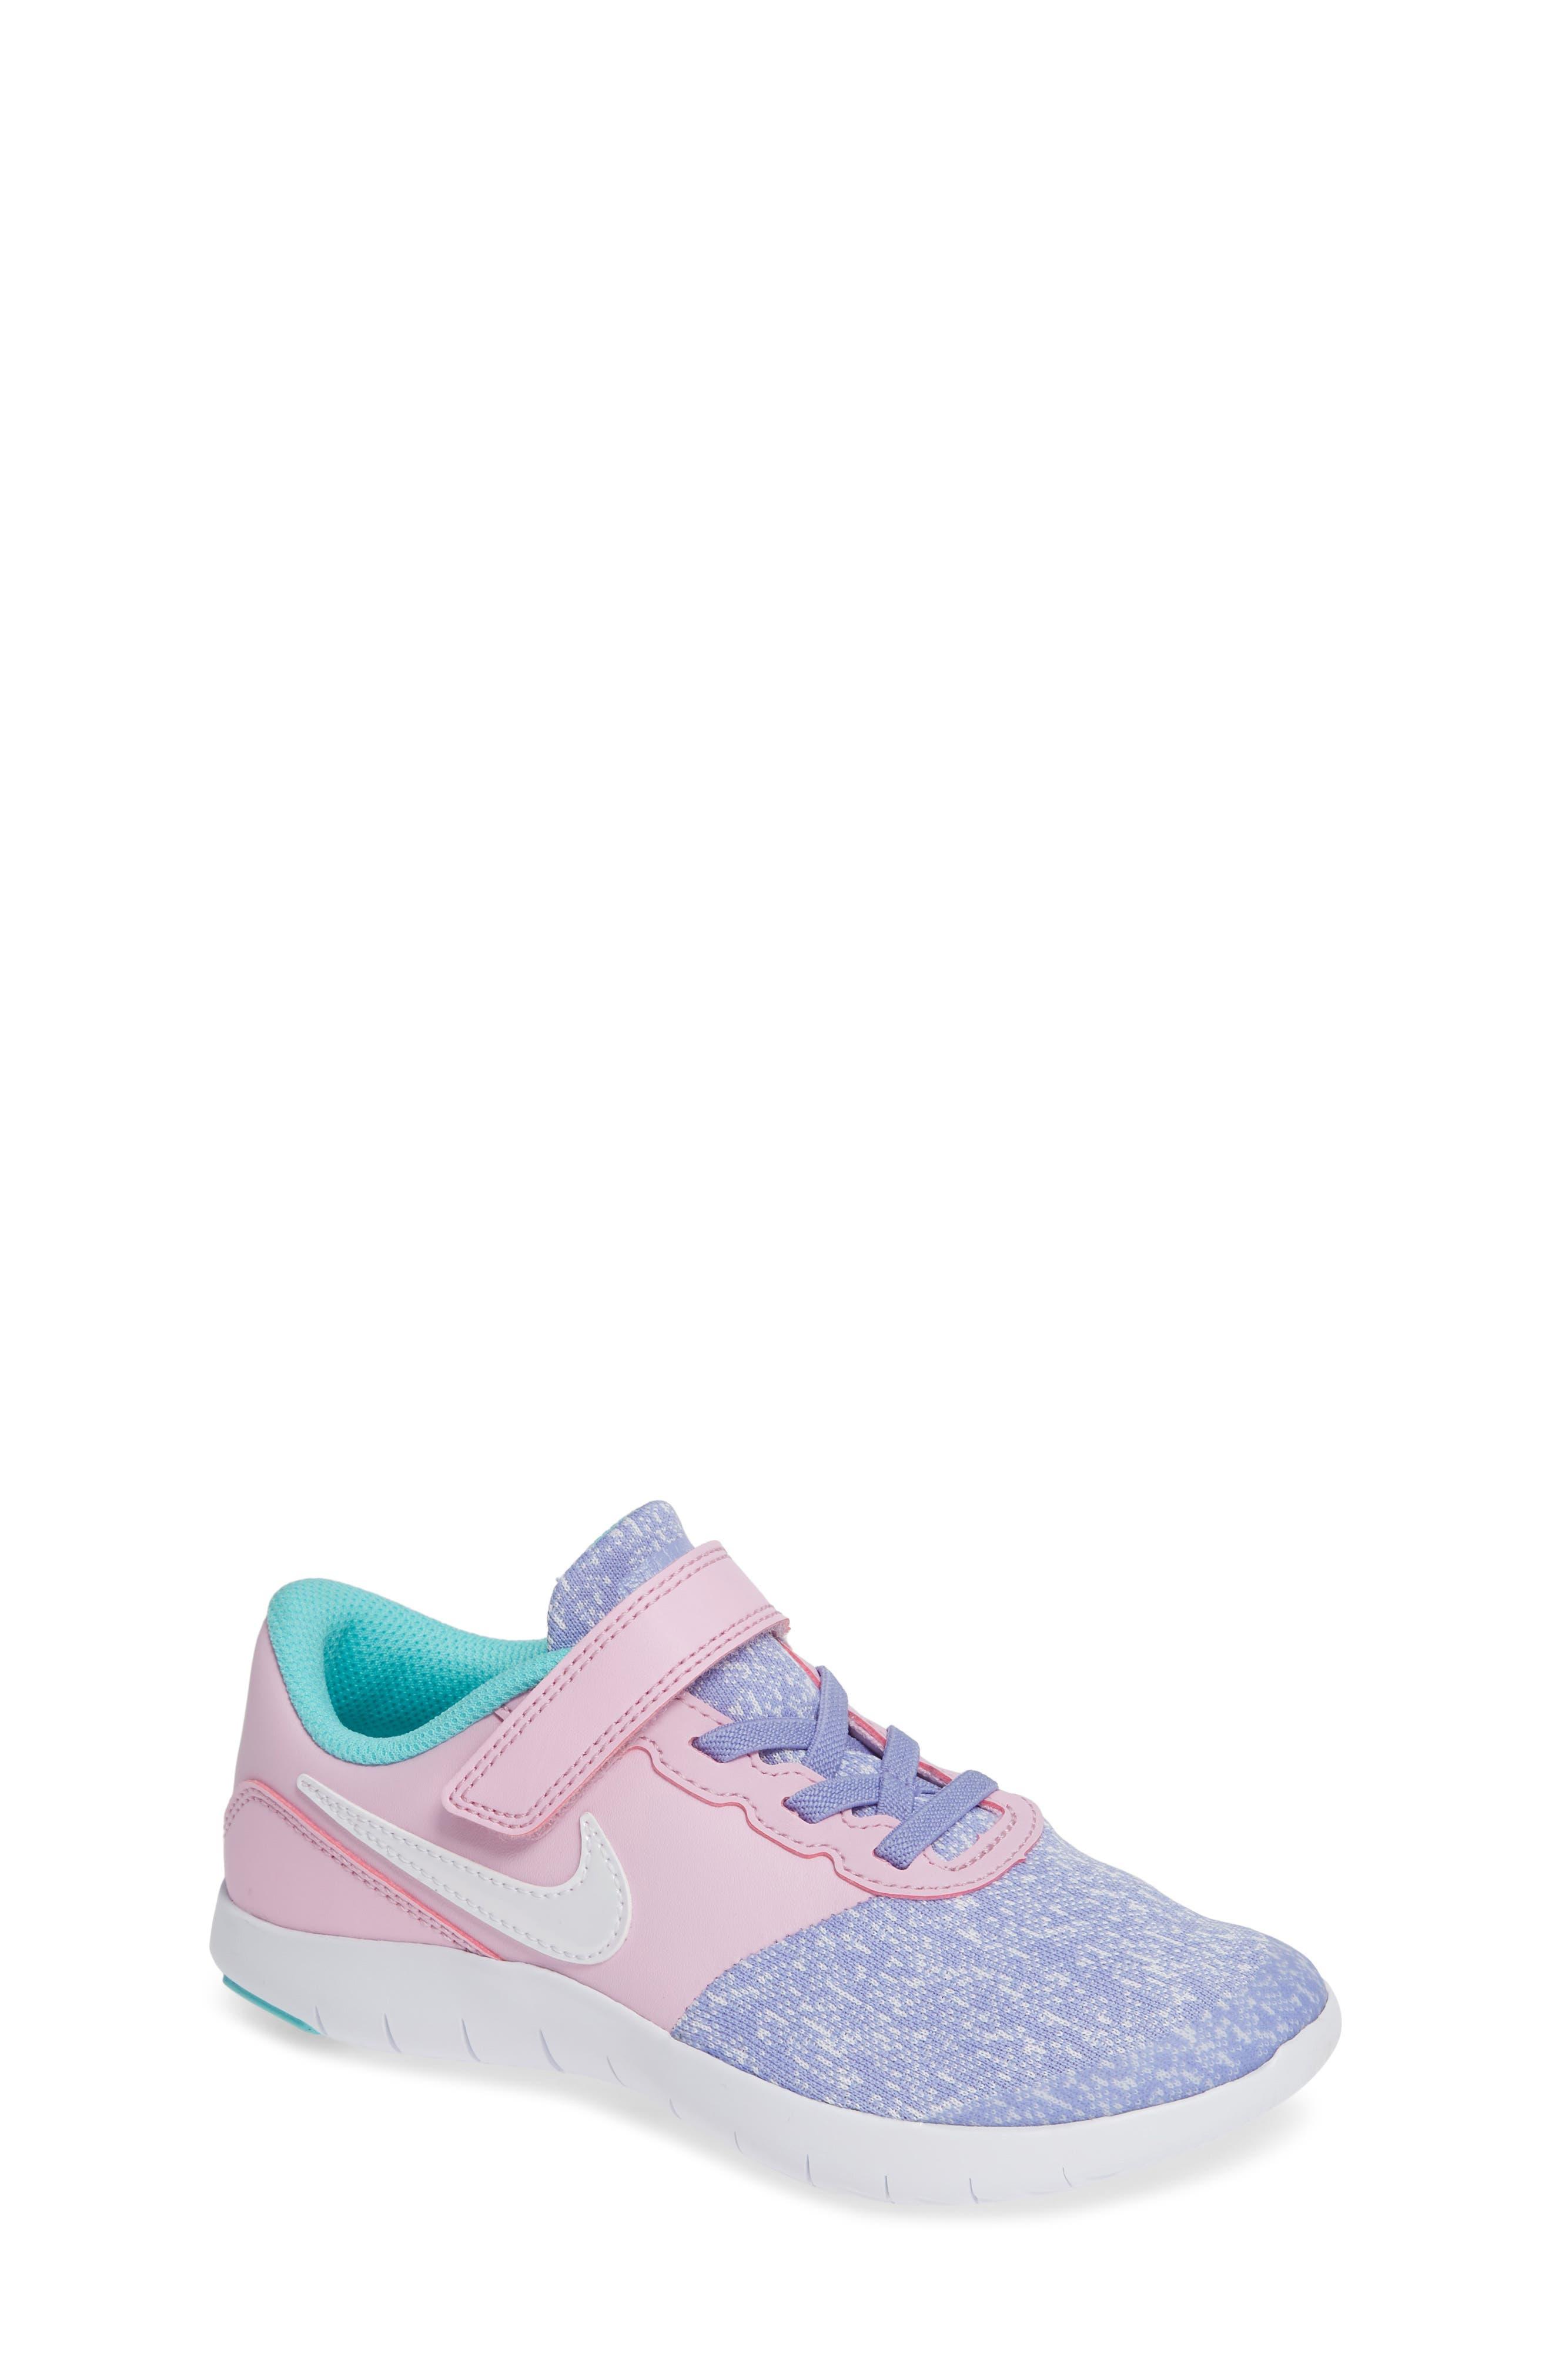 Flex Contact Running Shoe,                             Main thumbnail 1, color,                             TWILIGHT PULSE WHITE AQUA